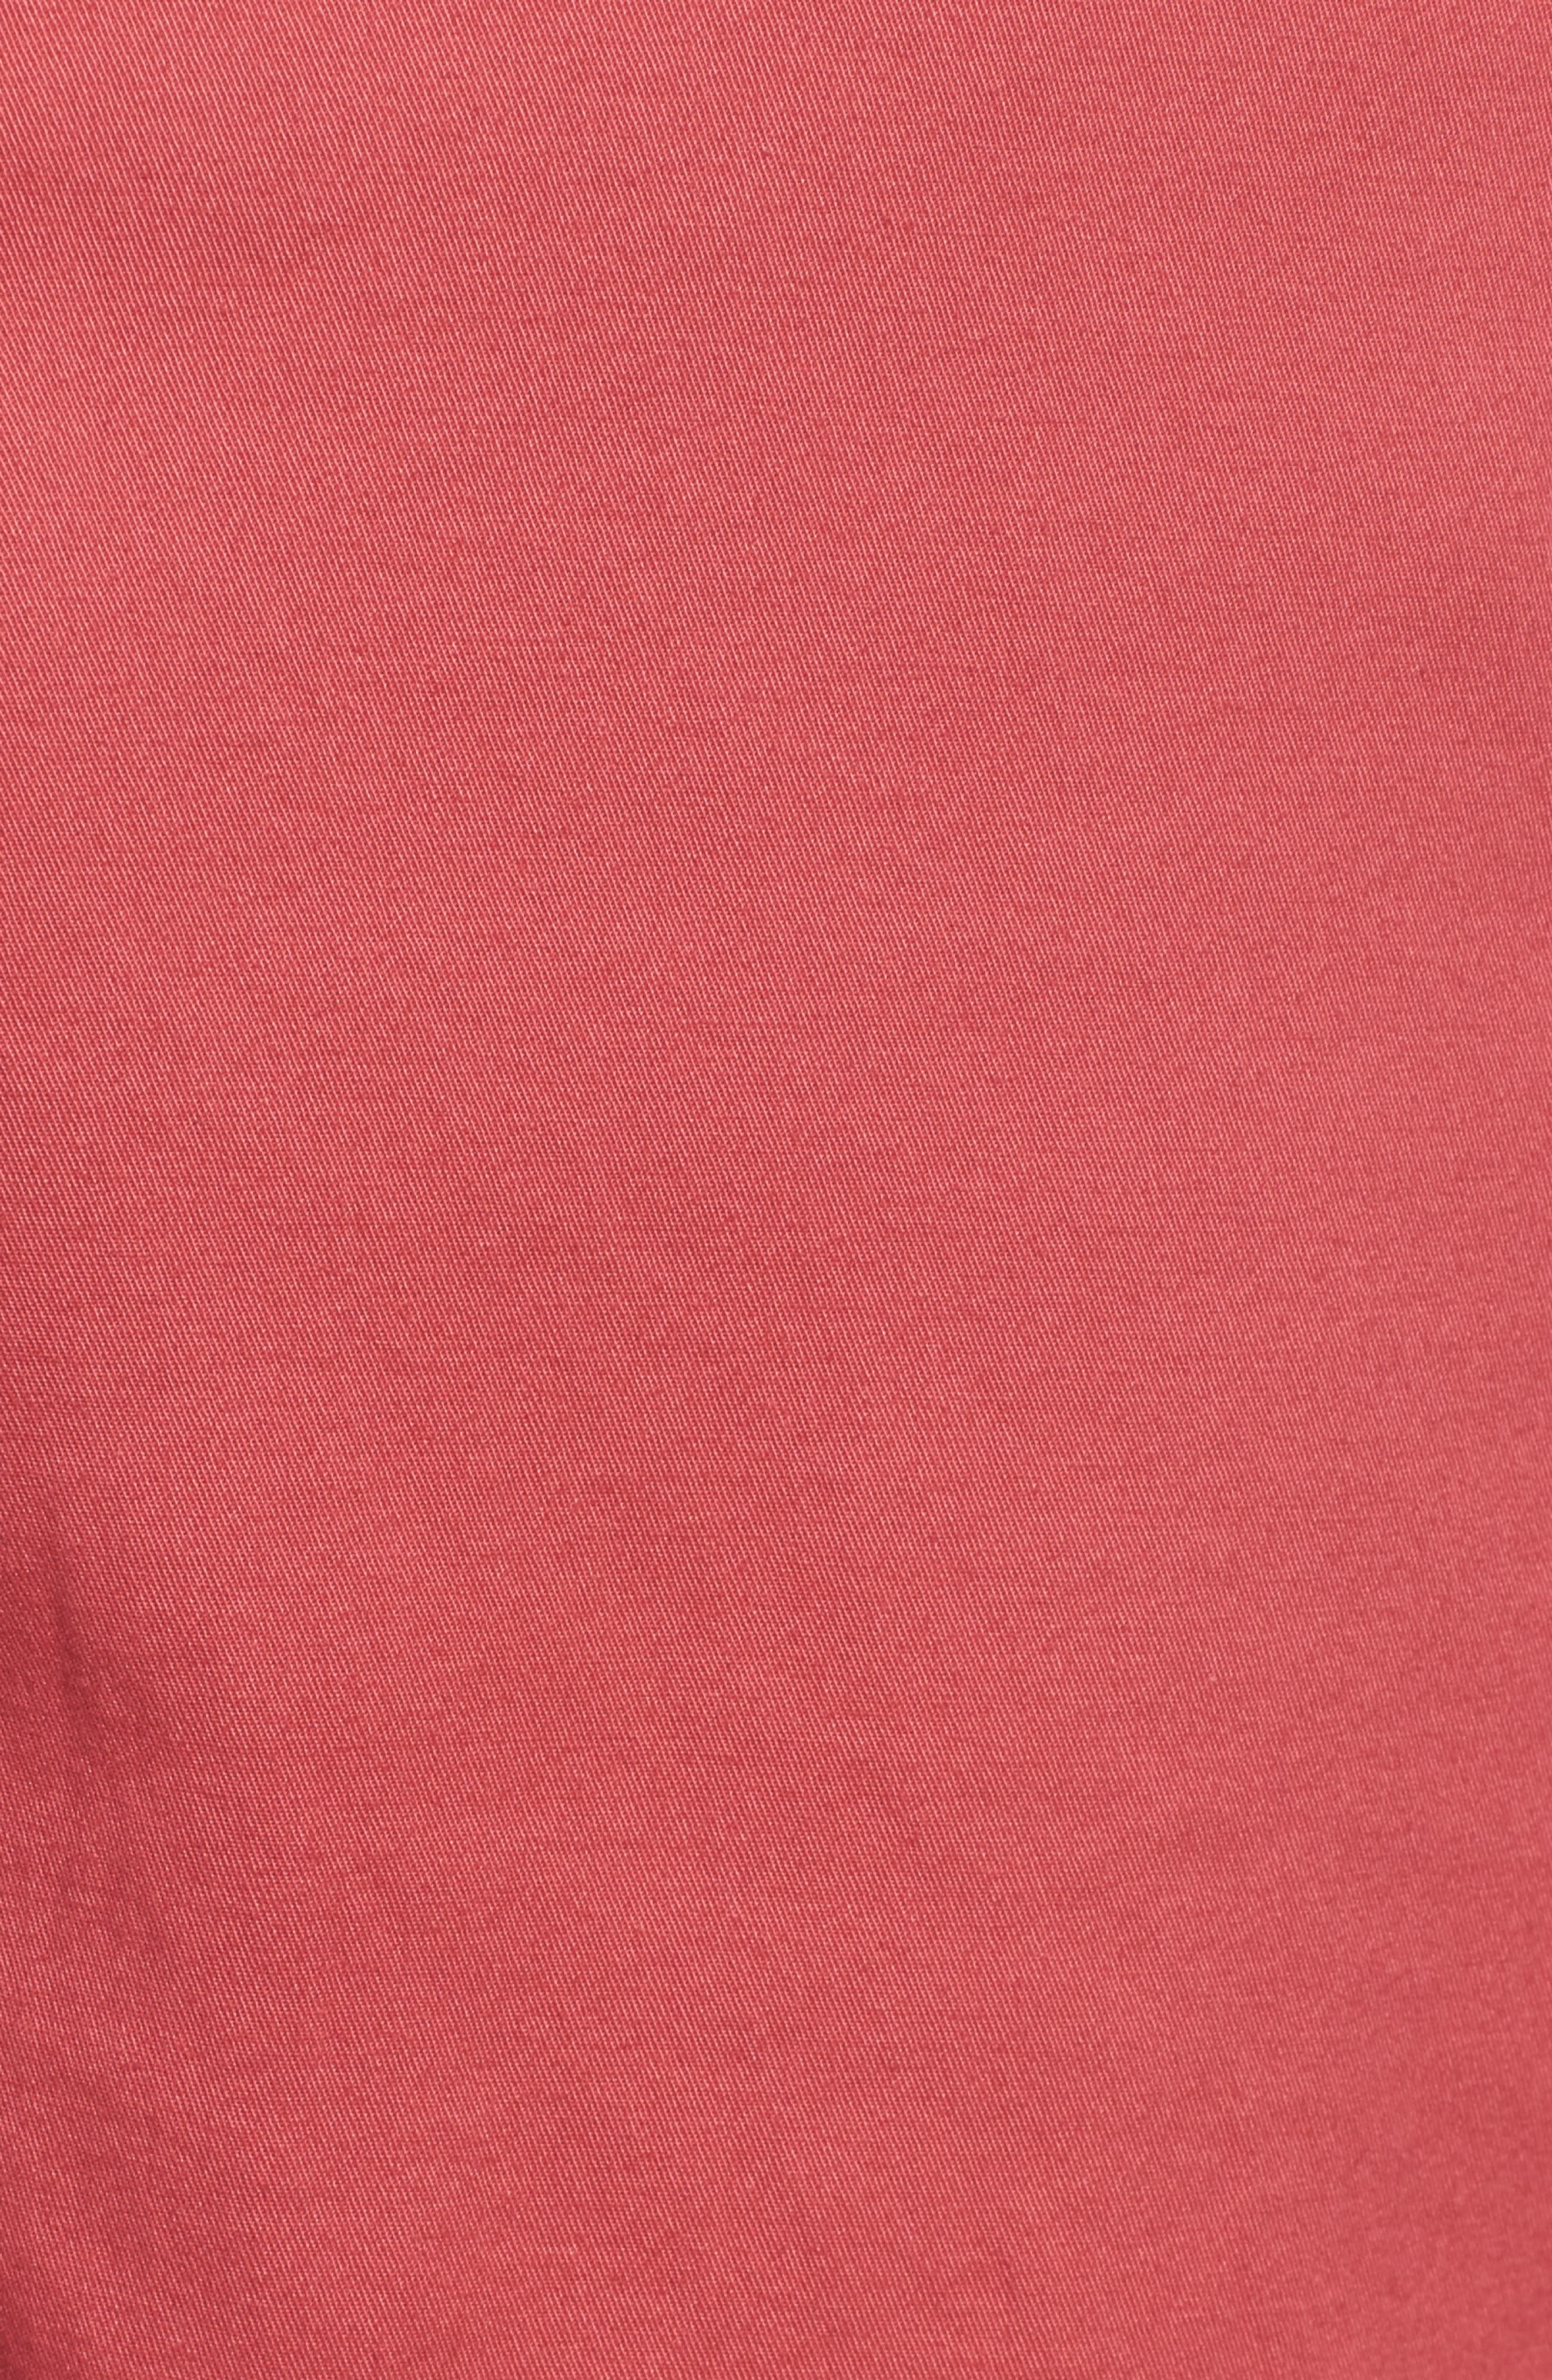 Alternate Image 5  - Ben Sherman Slim Stretch Chino Shorts